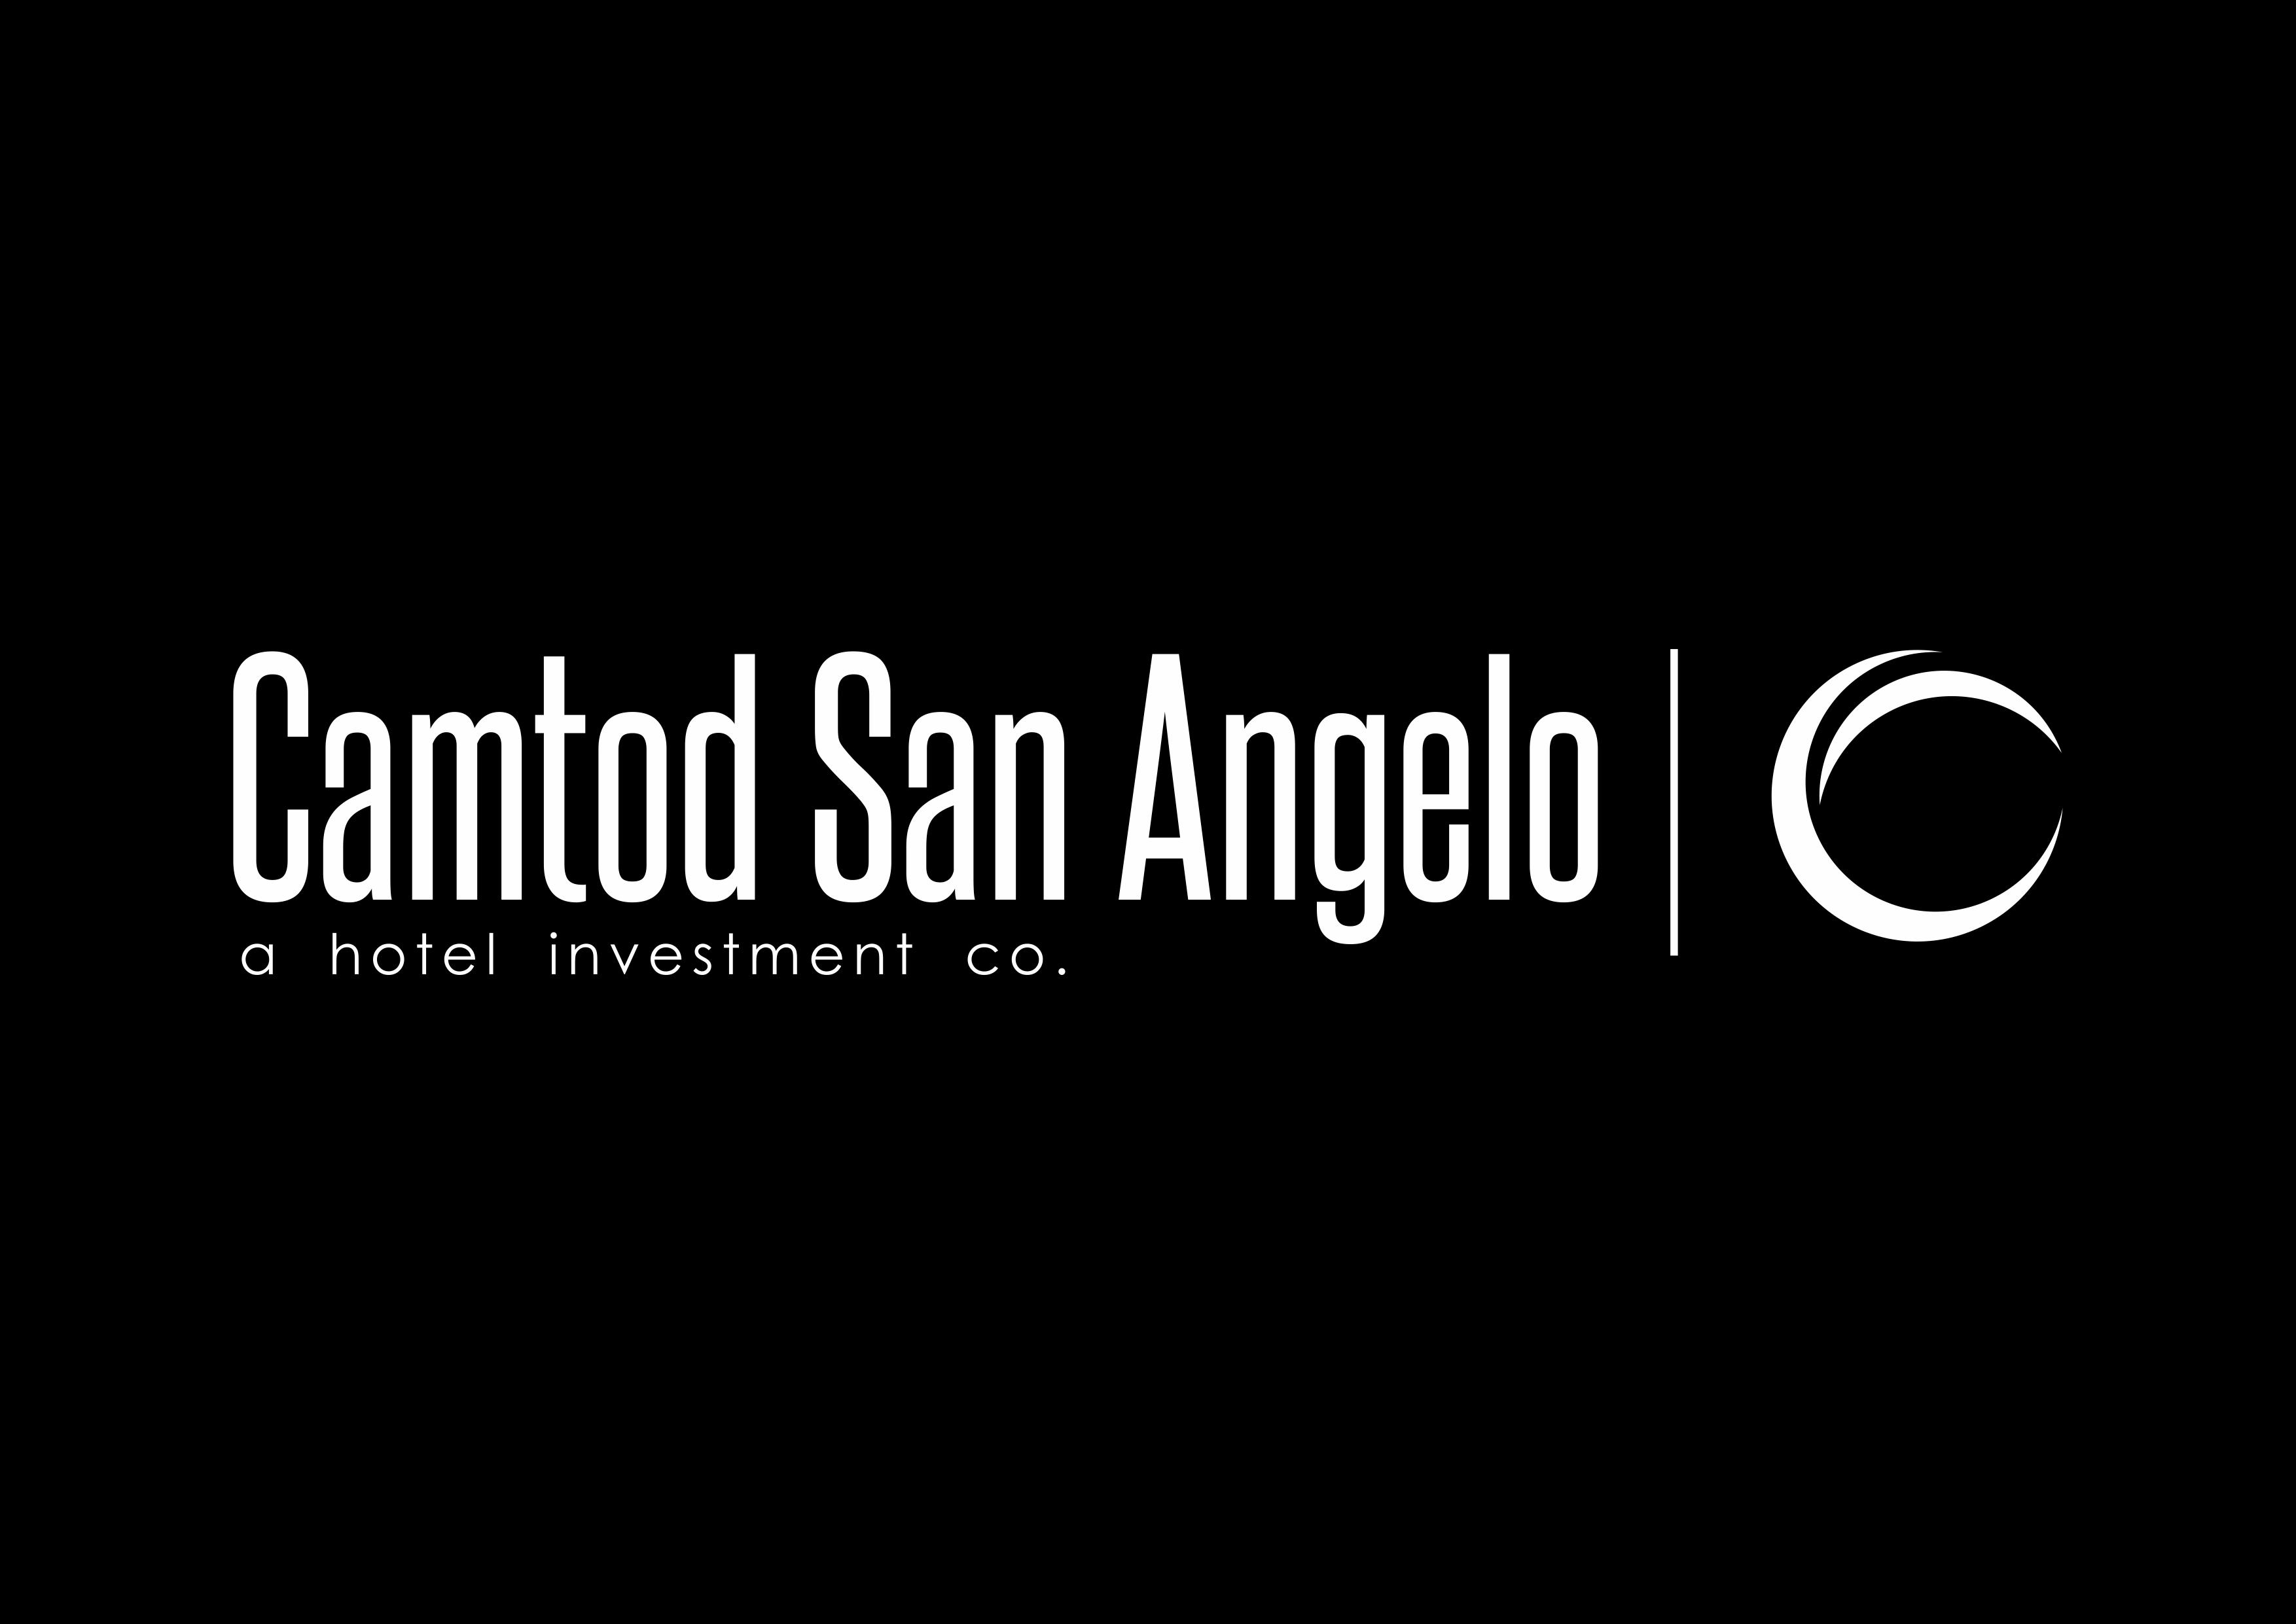 Camtod San Angelo, LLC